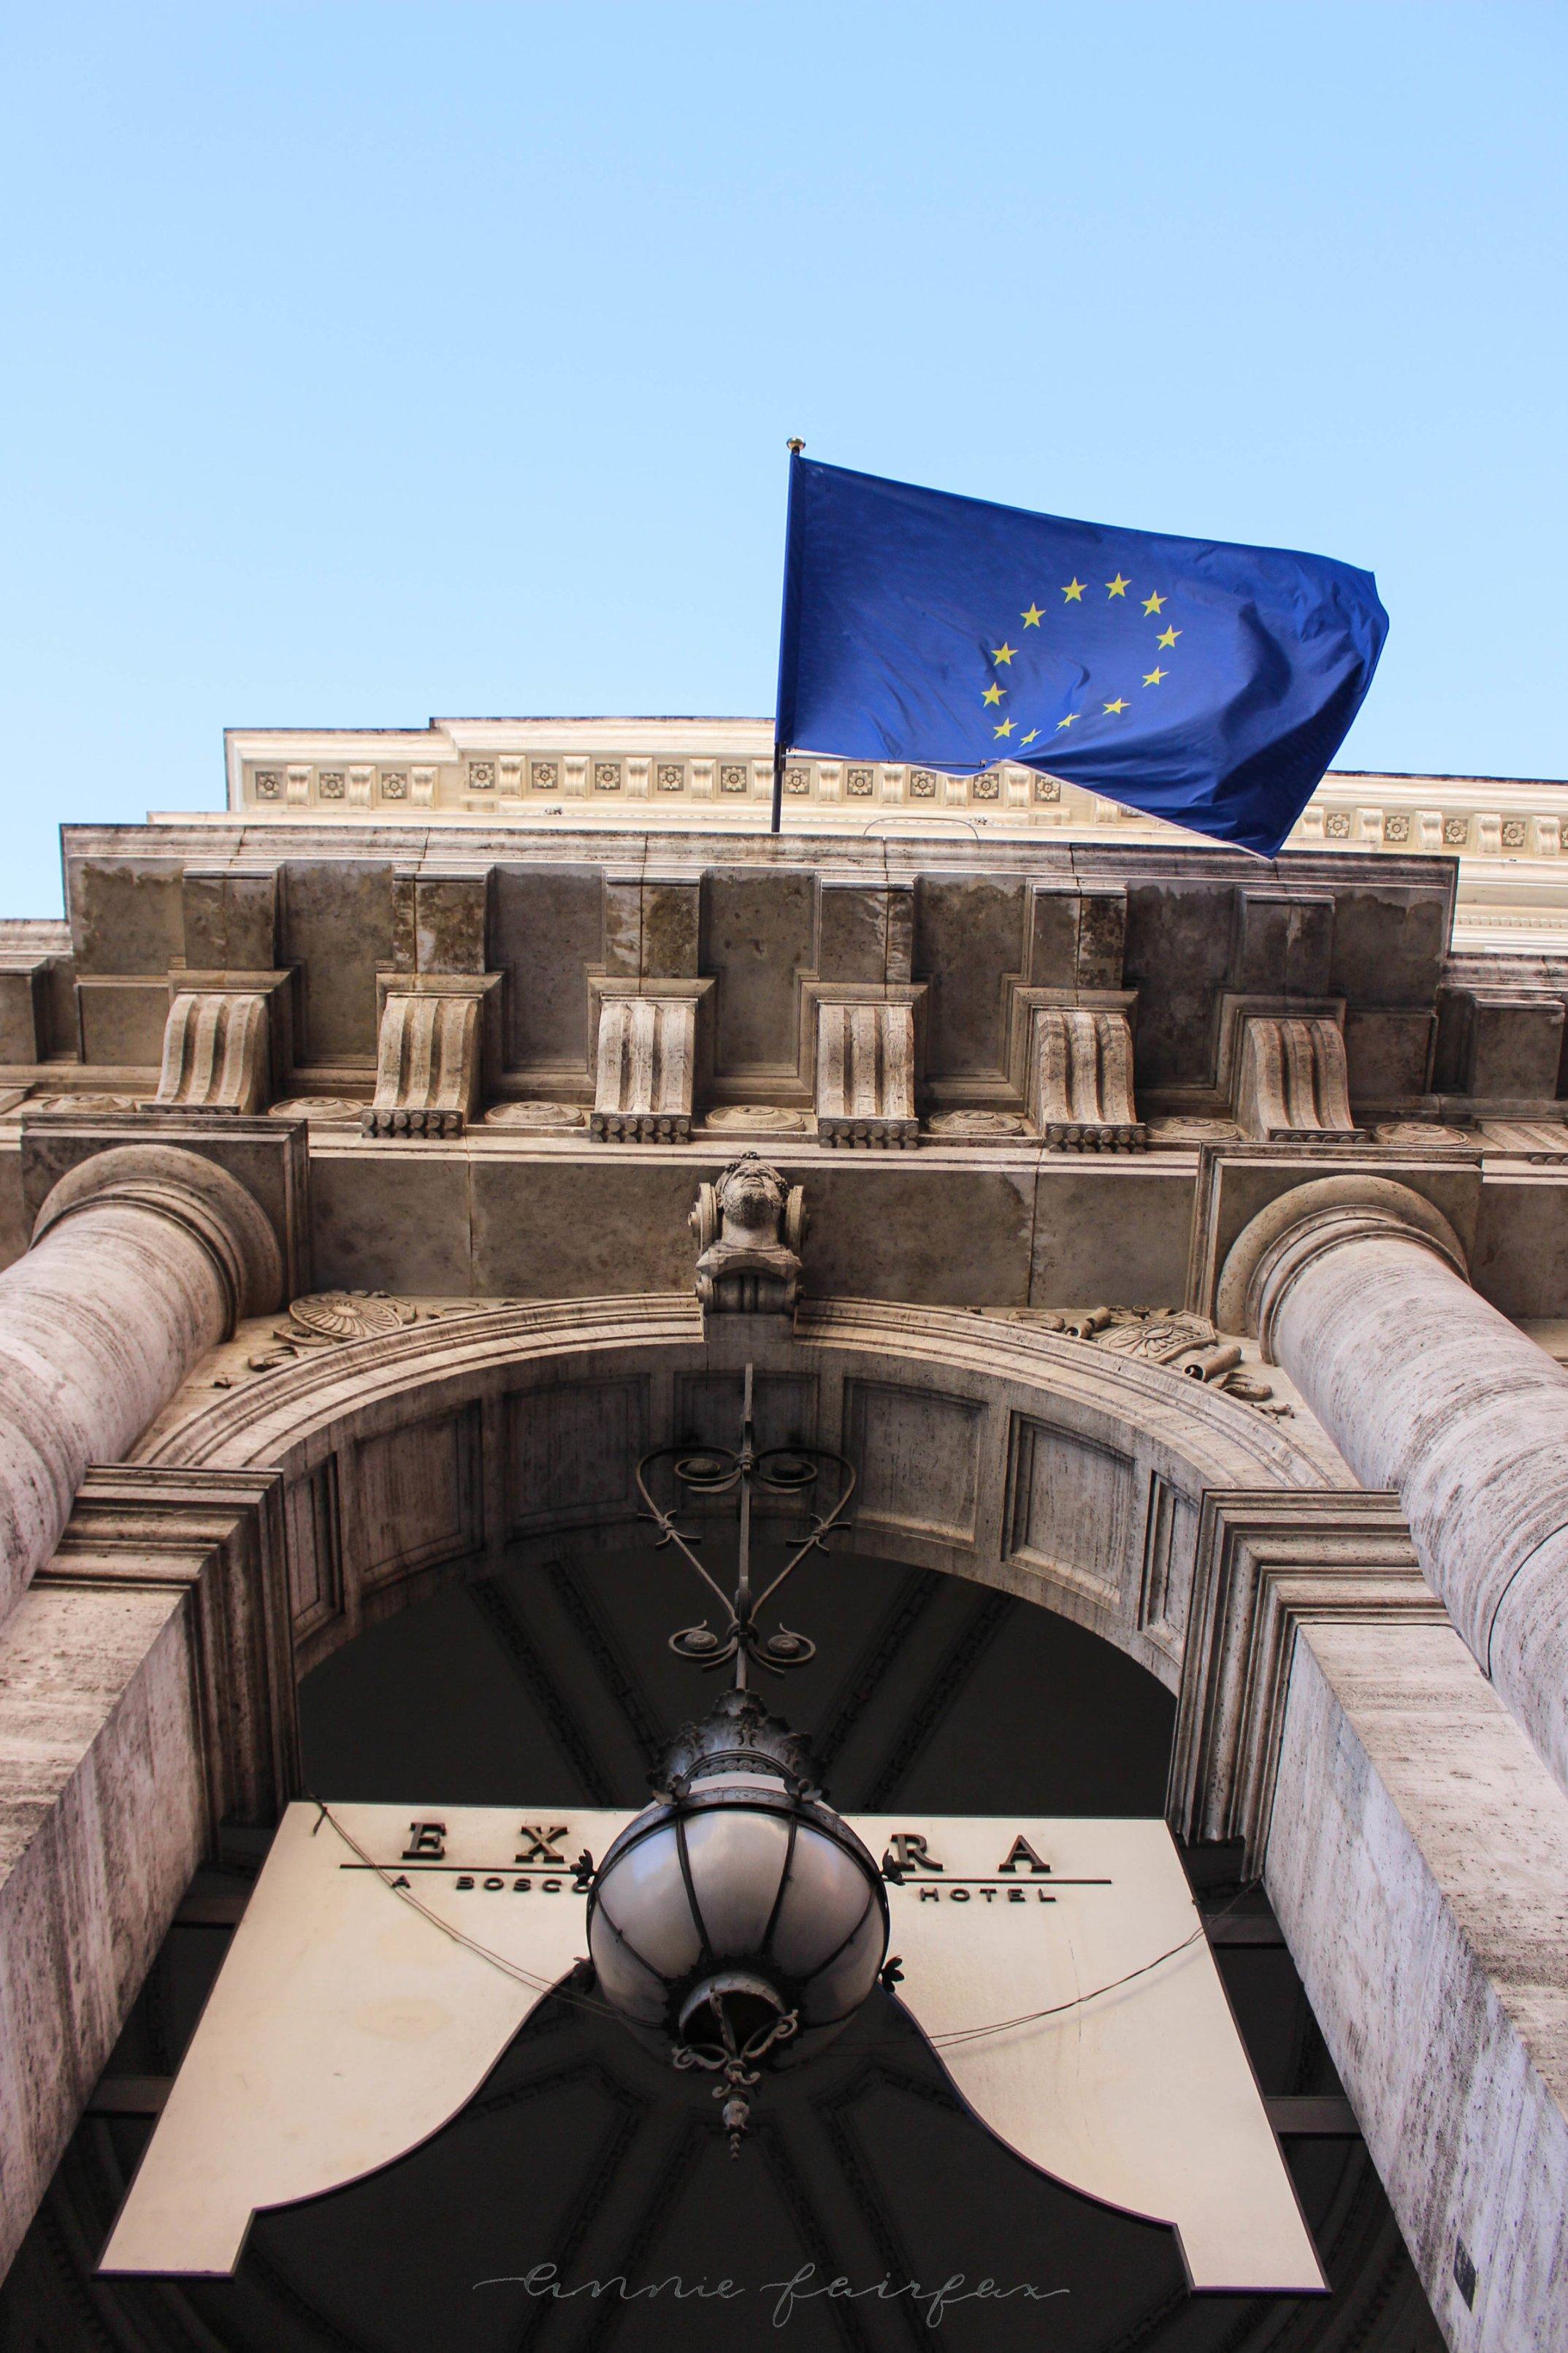 Boscolo Hotel in Rome: : The Complete Traveler's Guide